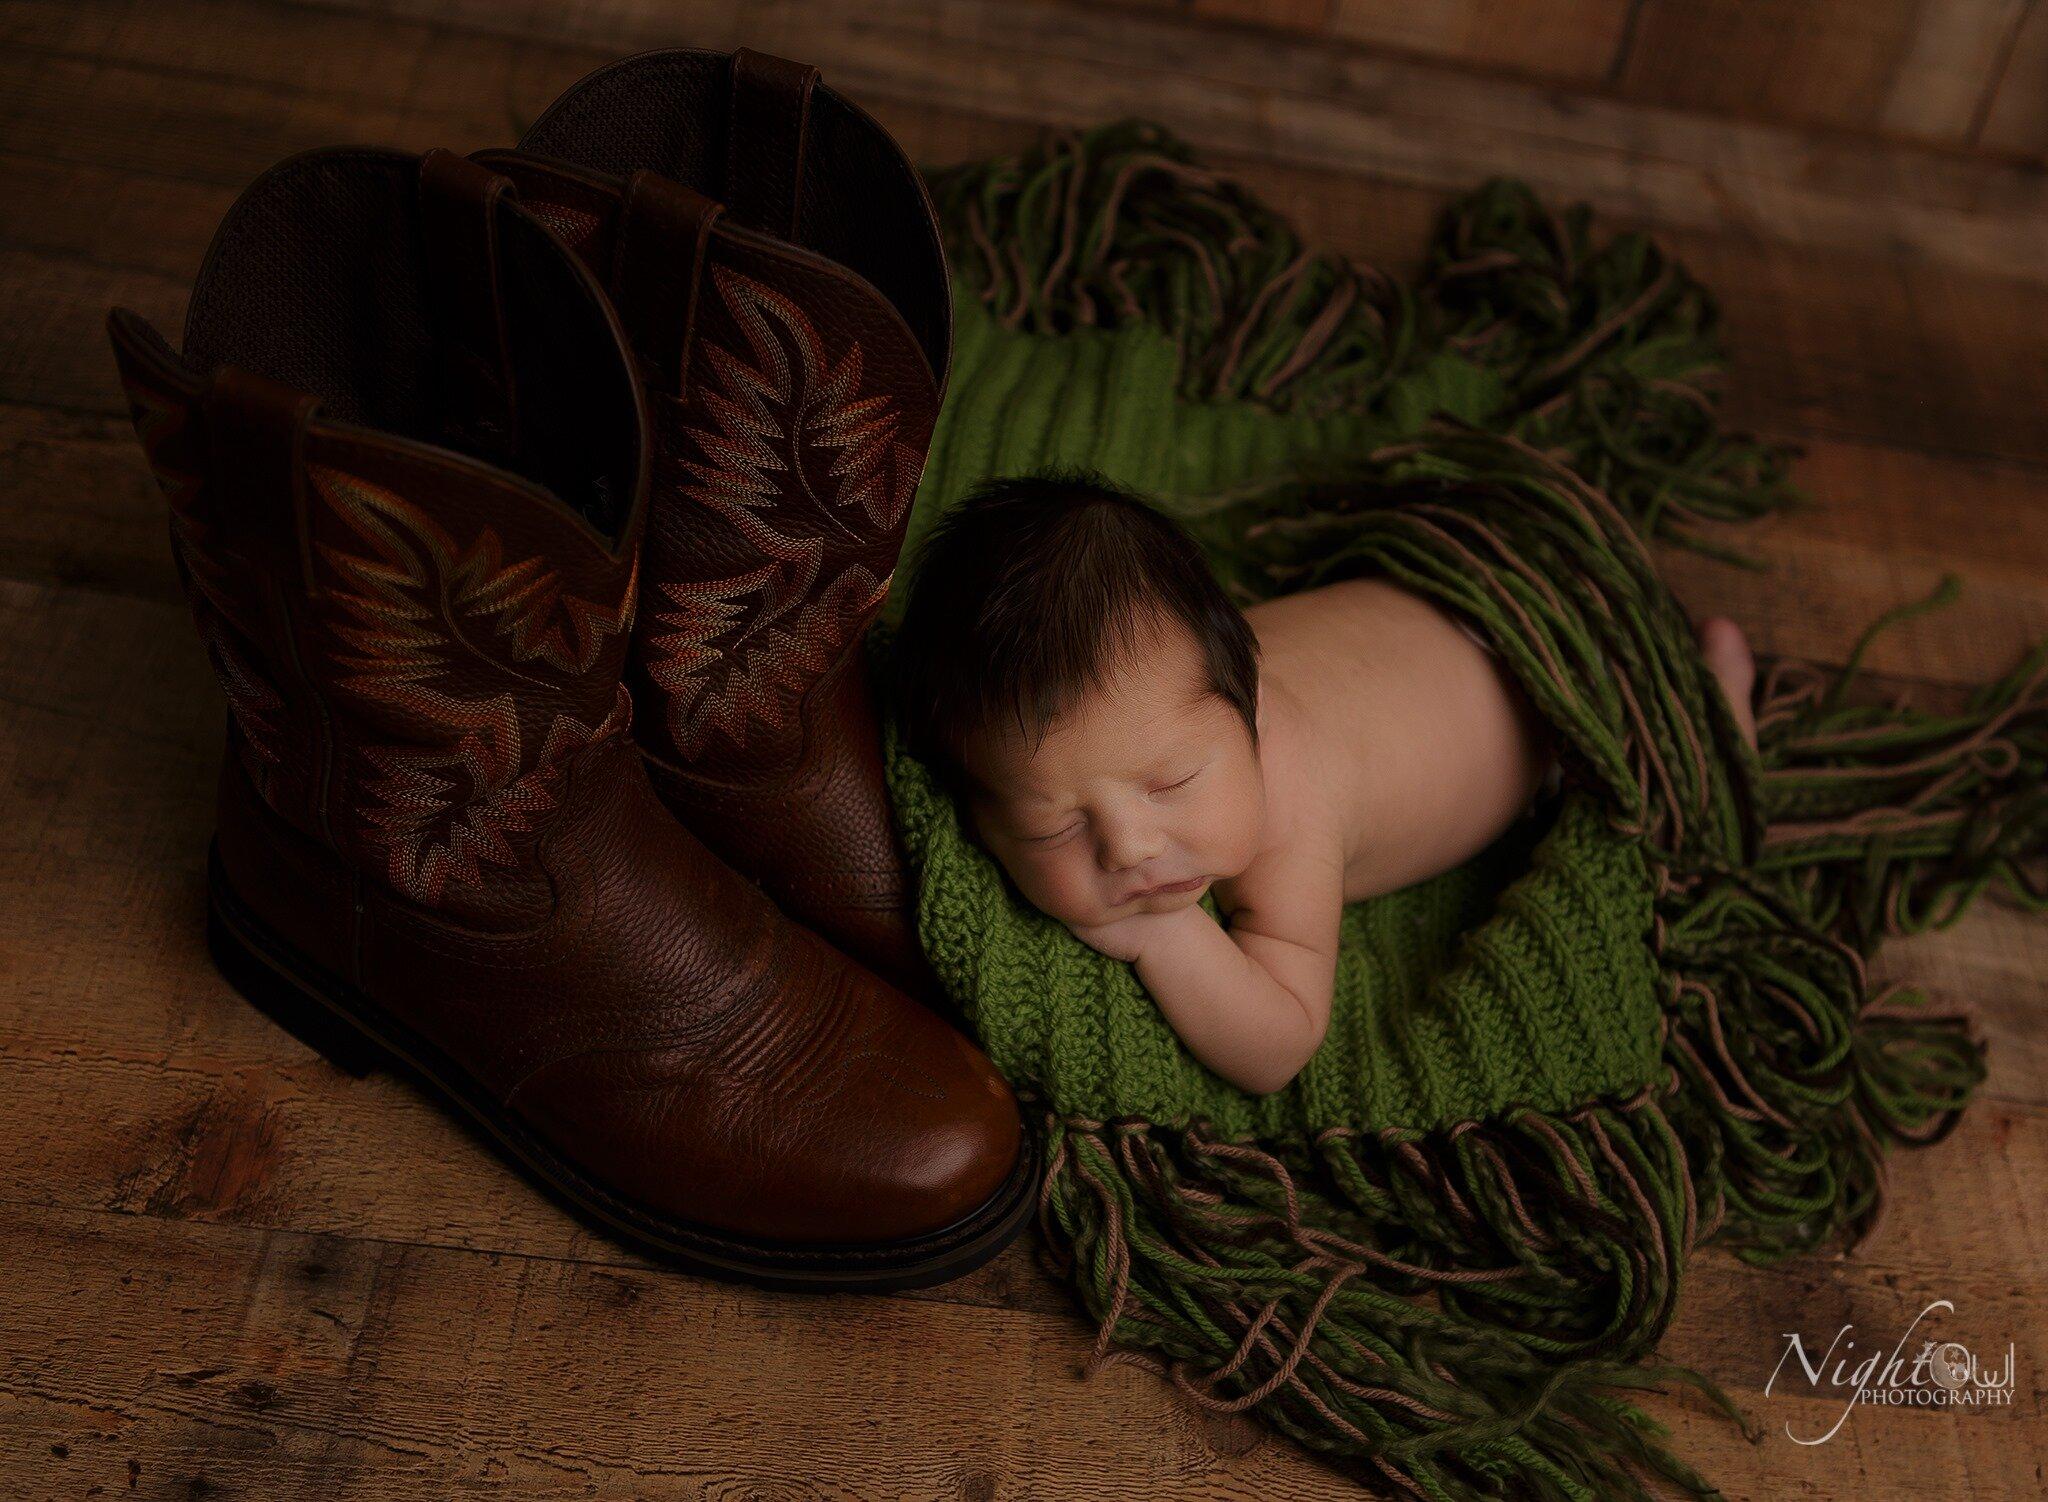 St. joseph Michigan newborn photography studio